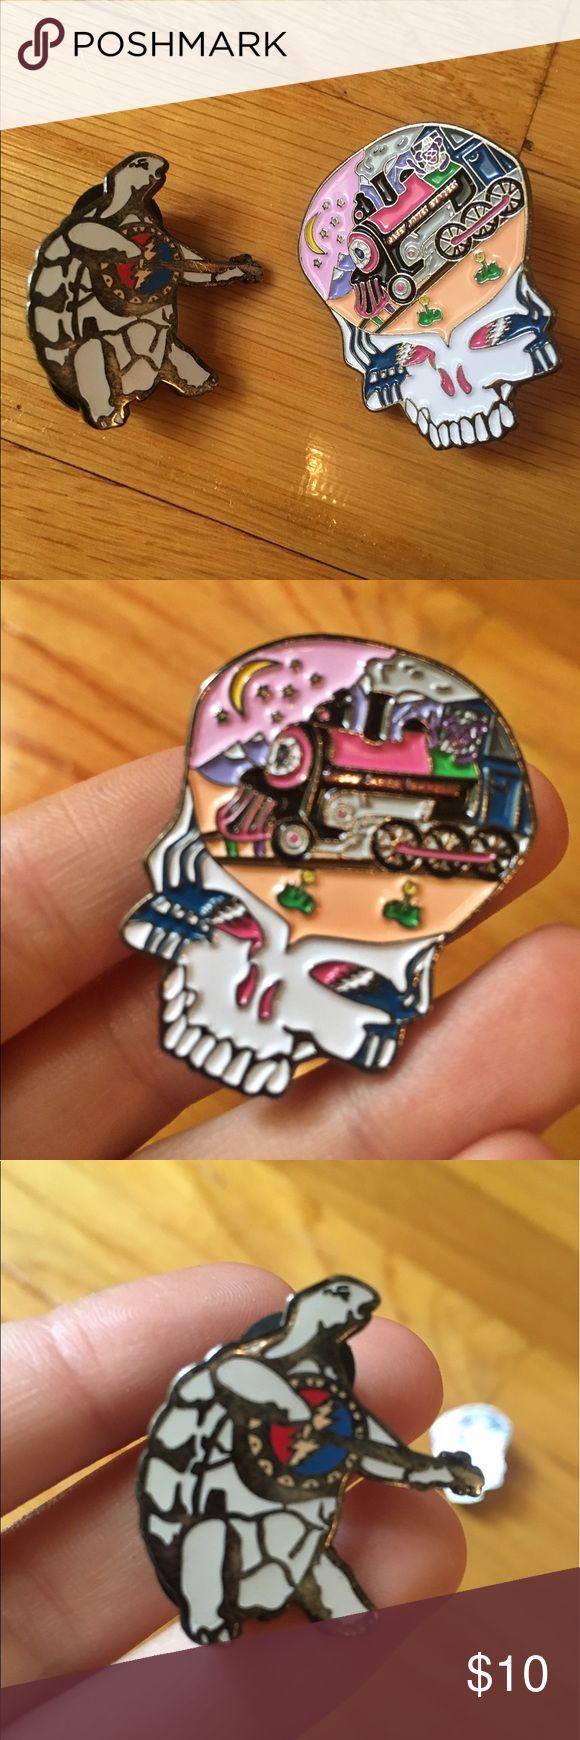 Terrapin / Casey Jones Grateful Dead hat pins Grateful Dead hat pins! Terrapin Traders turtle playing banjo pin / Casey Jones steal your face pin. BOTH for $10. ⚡️ Accessories